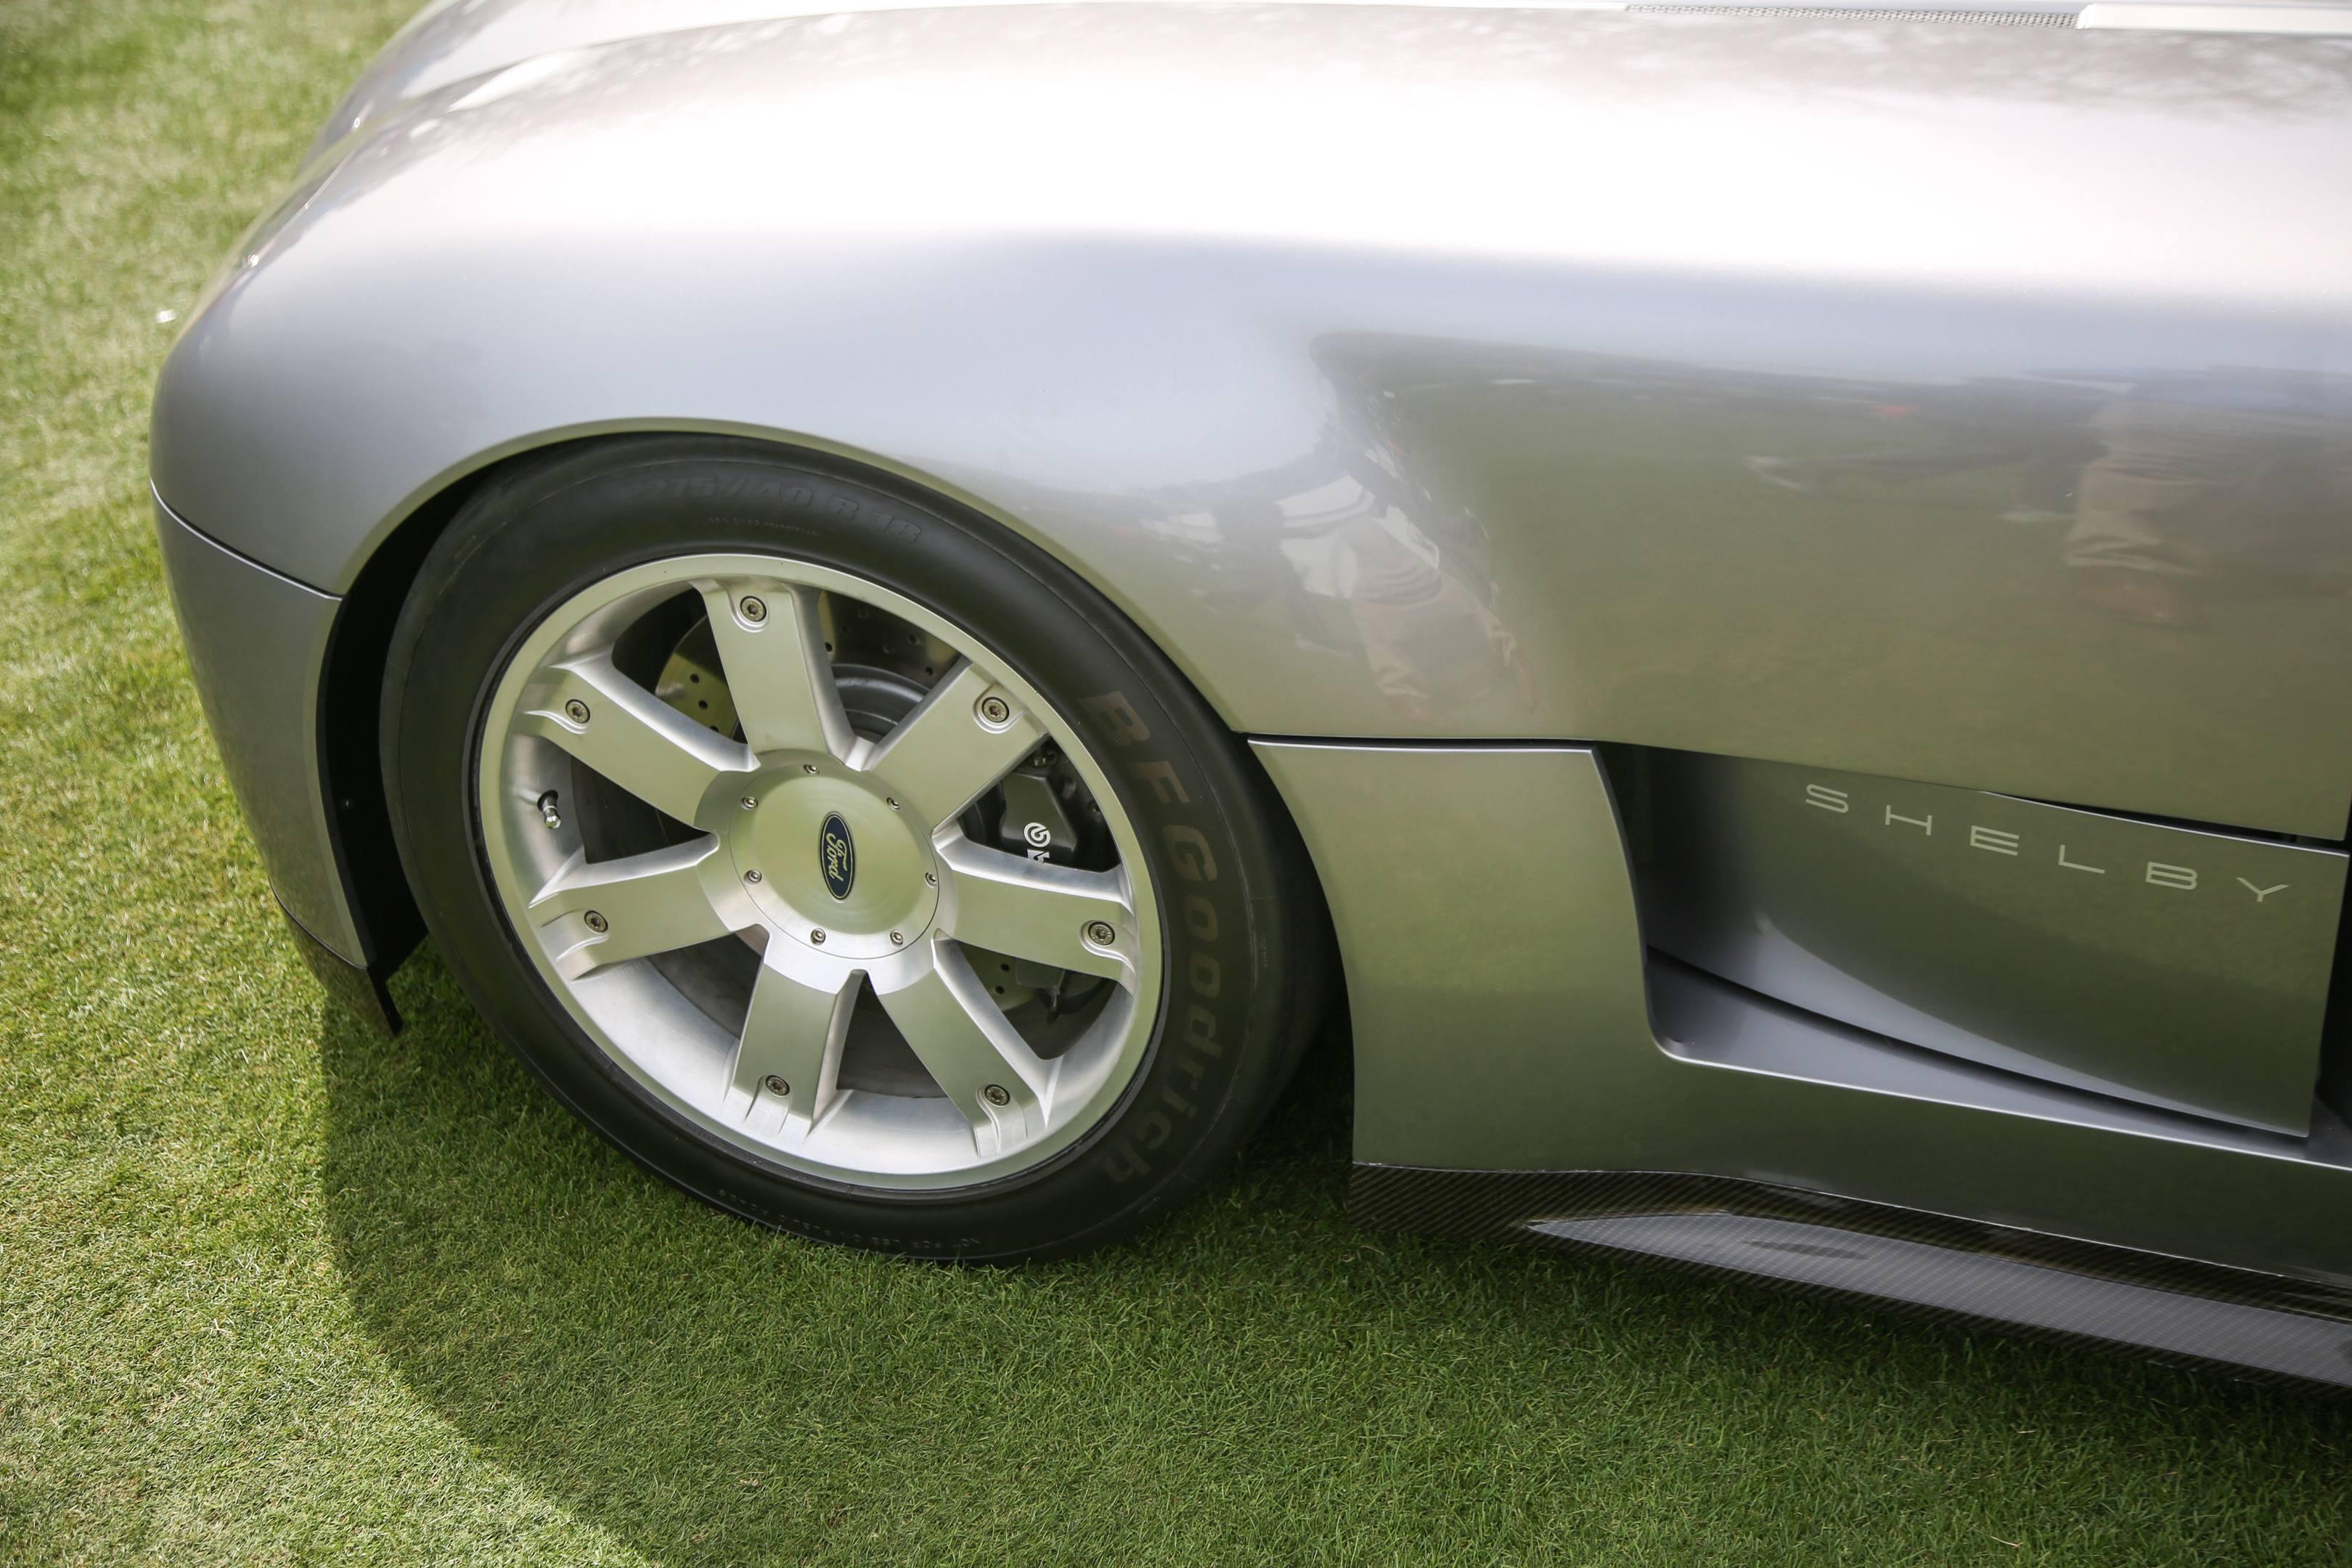 Shelby concept quarter panel detail